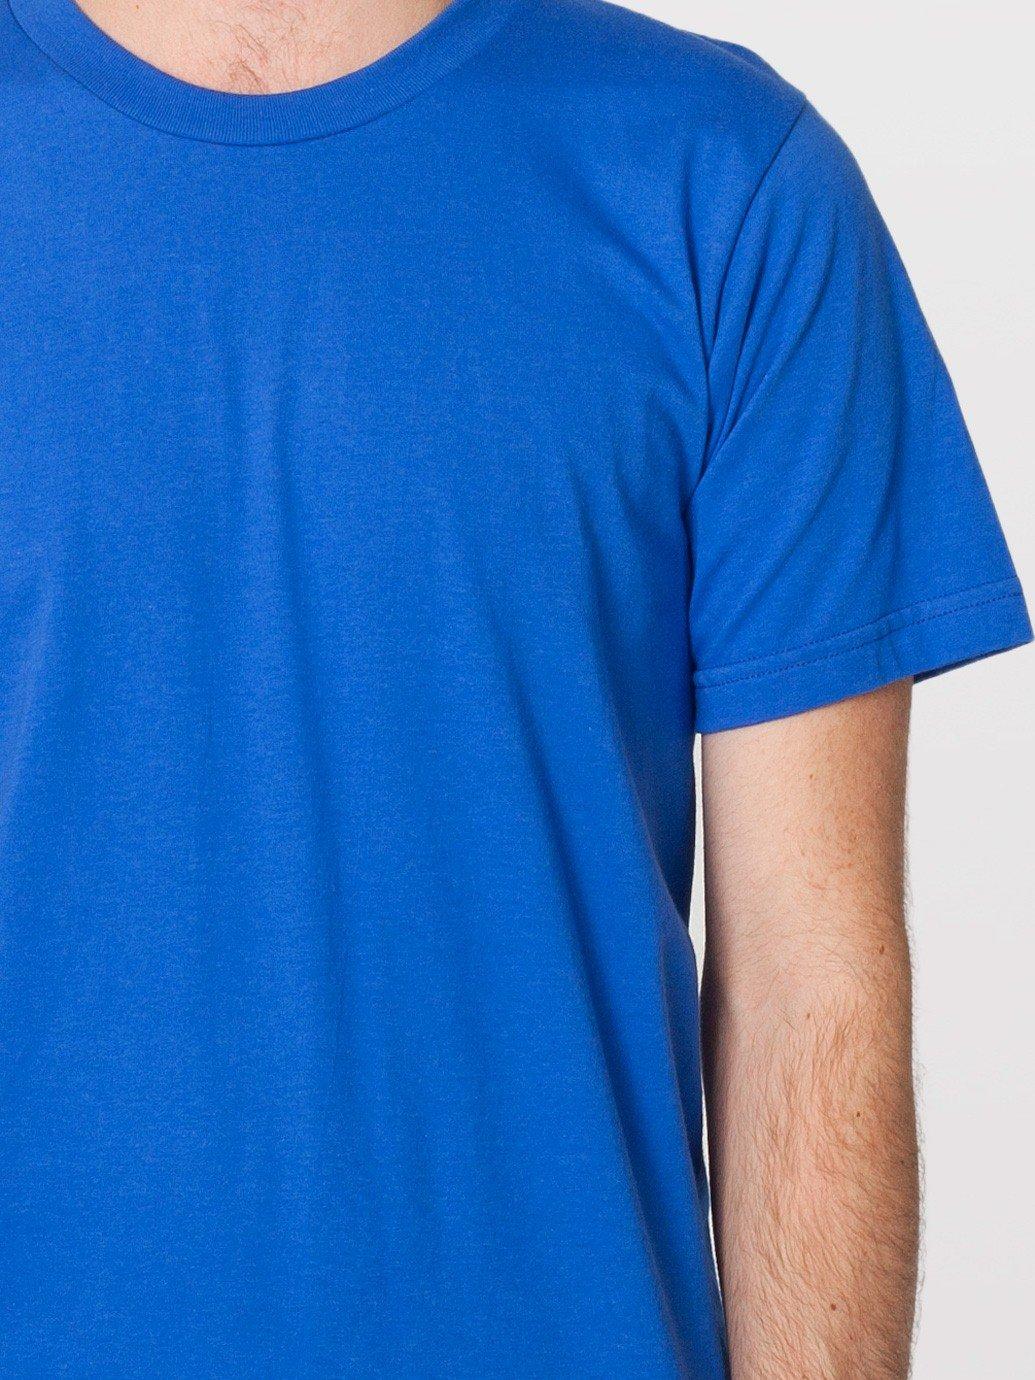 American apparel fine jersey short sleeve t shirt evan for American apparel fine jersey crewneck t shirt